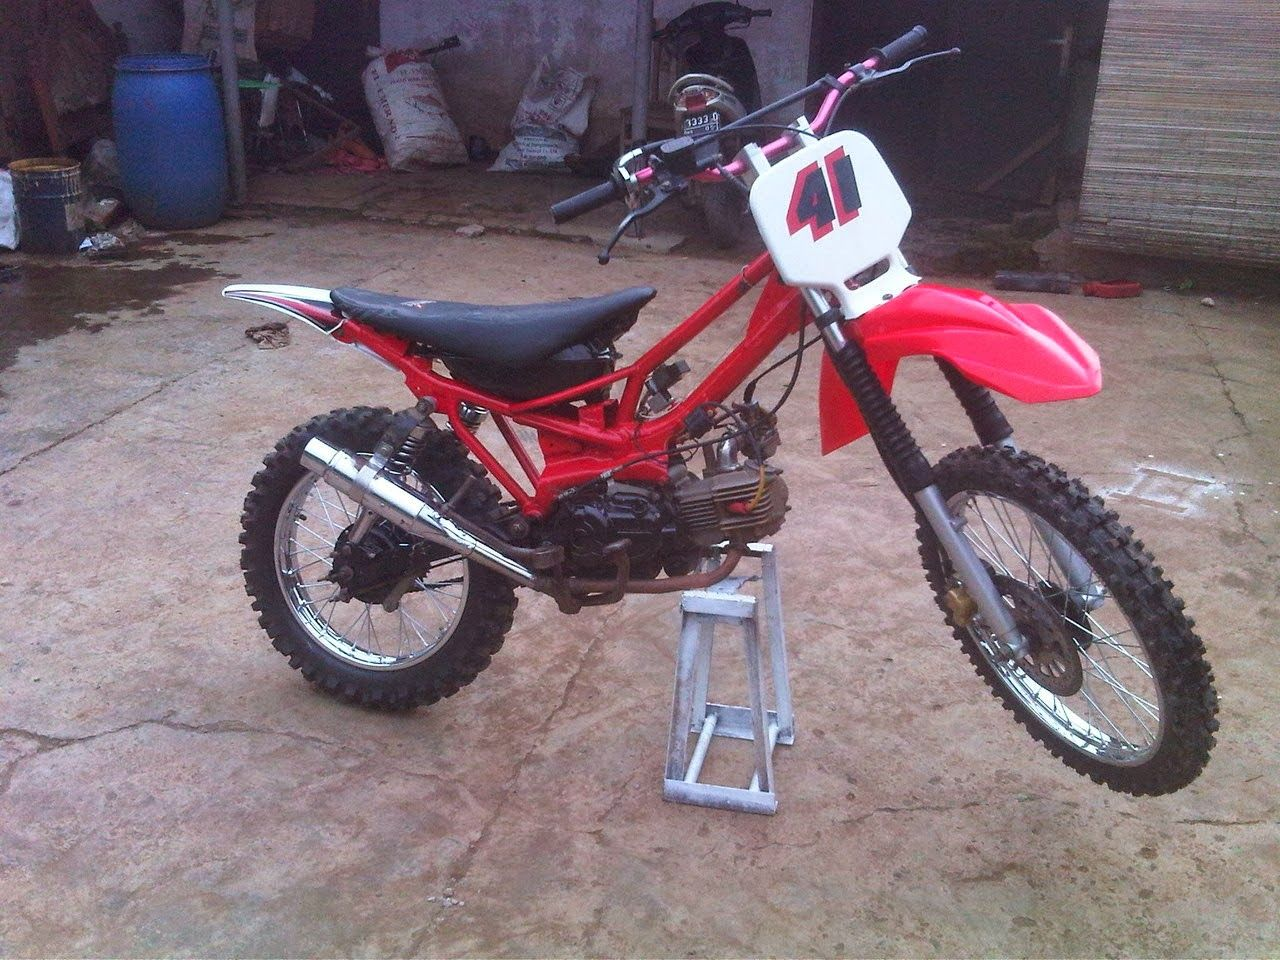 Modifikasi Honda Karisma Jadi Trail Thecitycyclist Motor Bebek